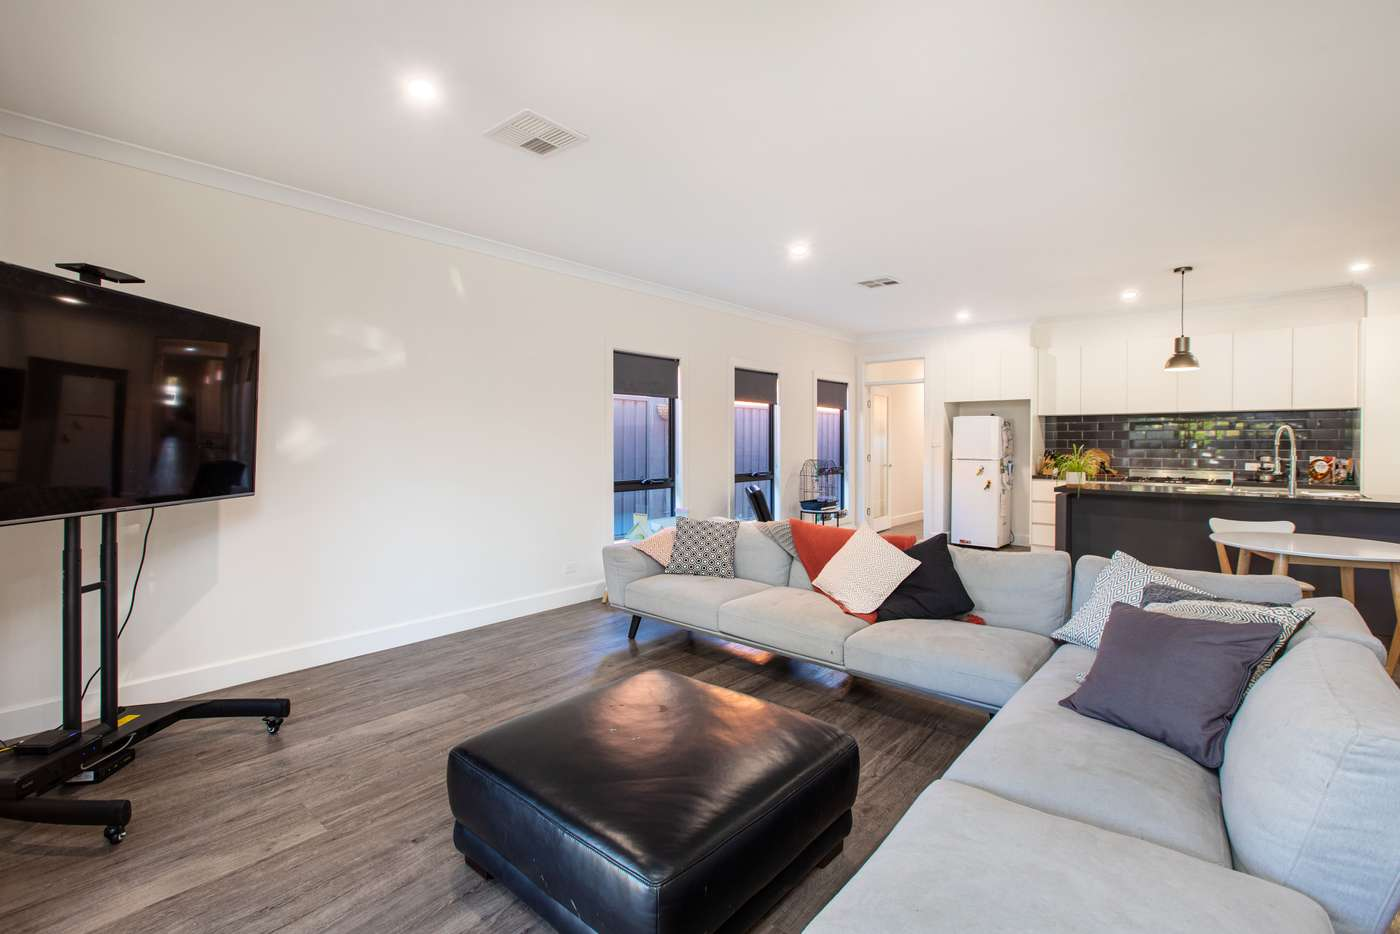 Sixth view of Homely house listing, 174a Thirteenth Street, Mildura VIC 3500